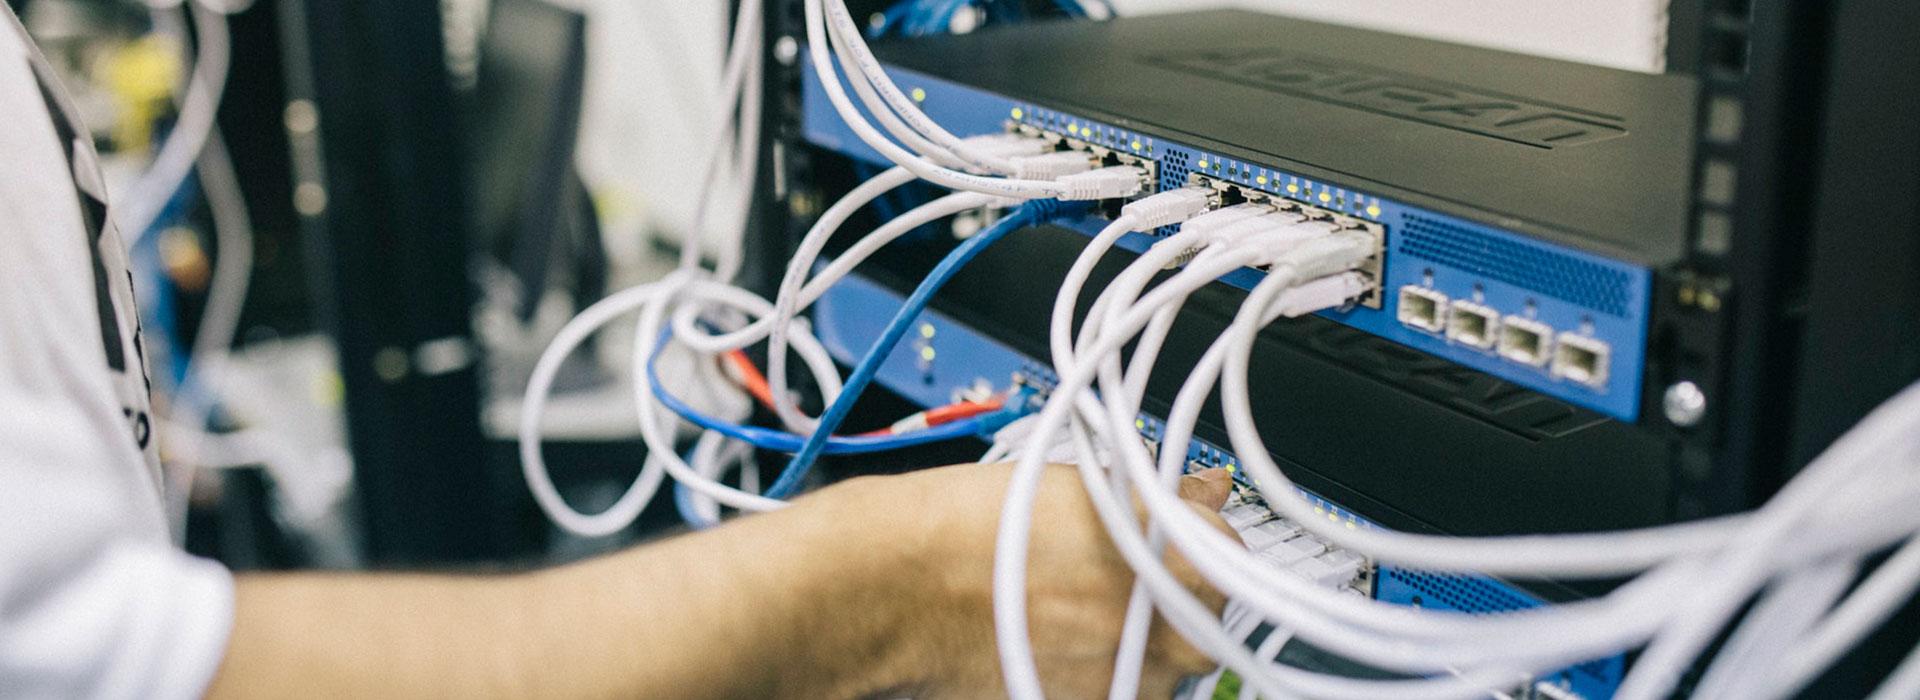 http://sedaser.com/wp-content/uploads/2018/07/empresa-mantenimiento-redes-informaticas-granada.jpg